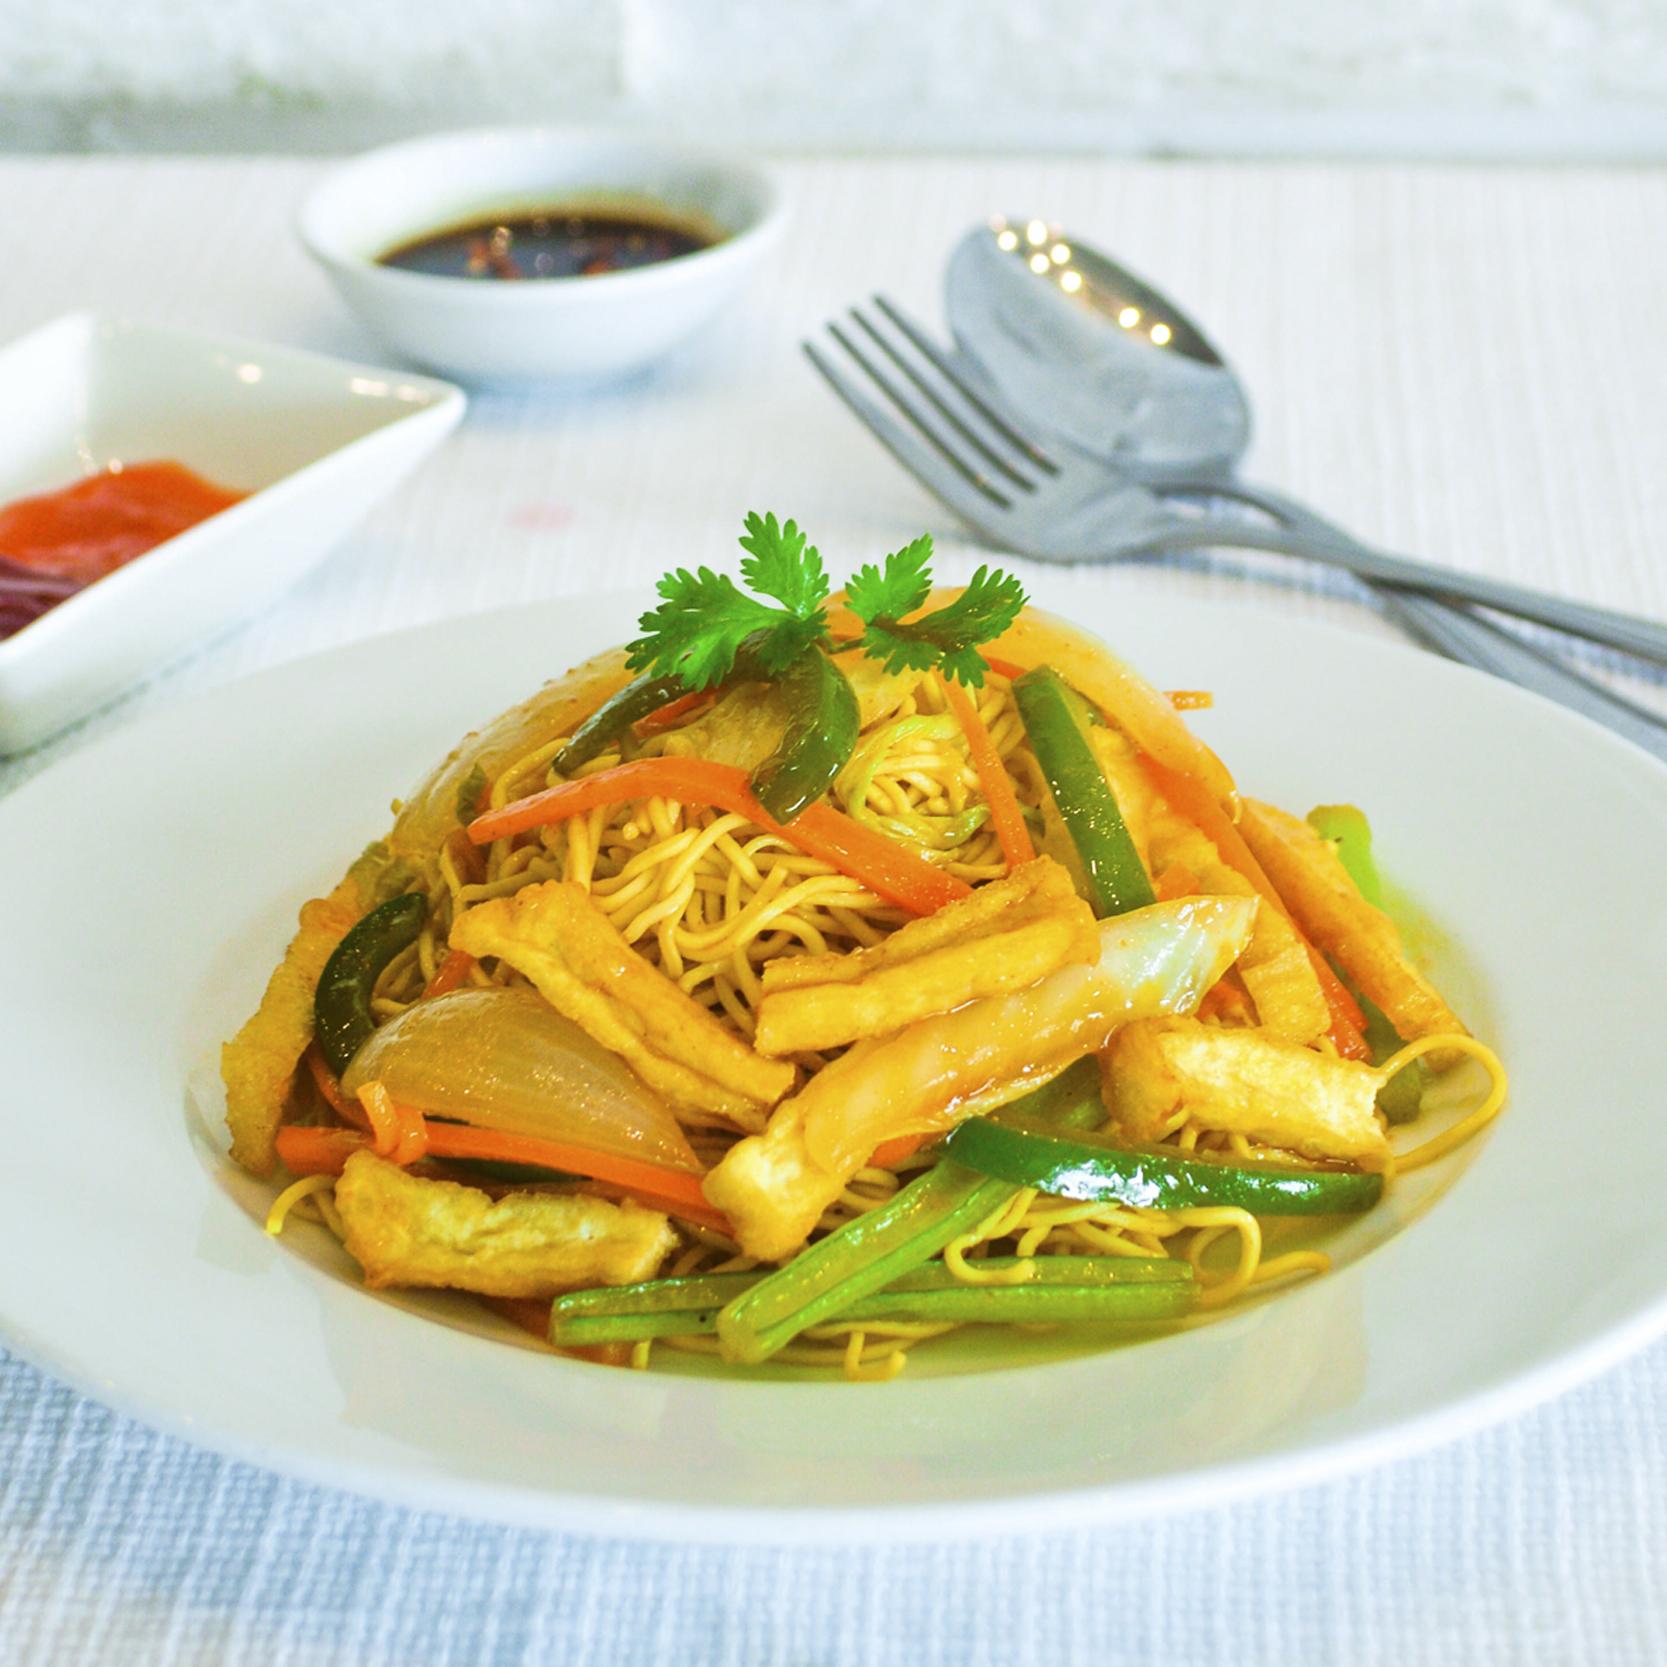 Stir-fried Vegetarian Instant Noodles (Mi Xao Chay)